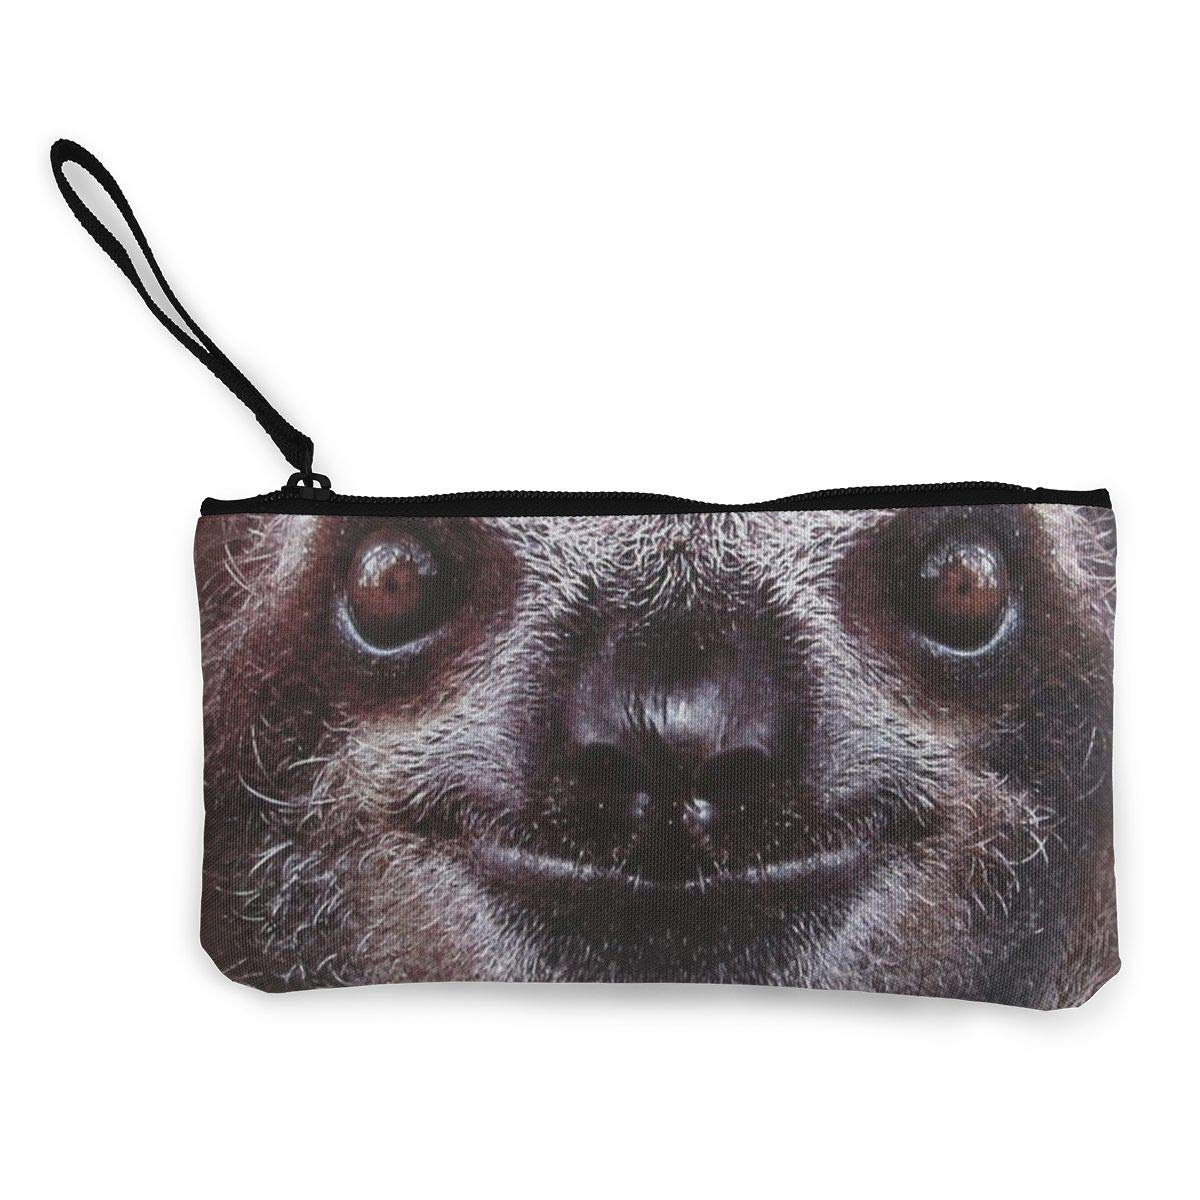 Canvas Cash Coin Purse,Sloth Face Animal Print Make Up Bag Zipper Small Purse Wallets